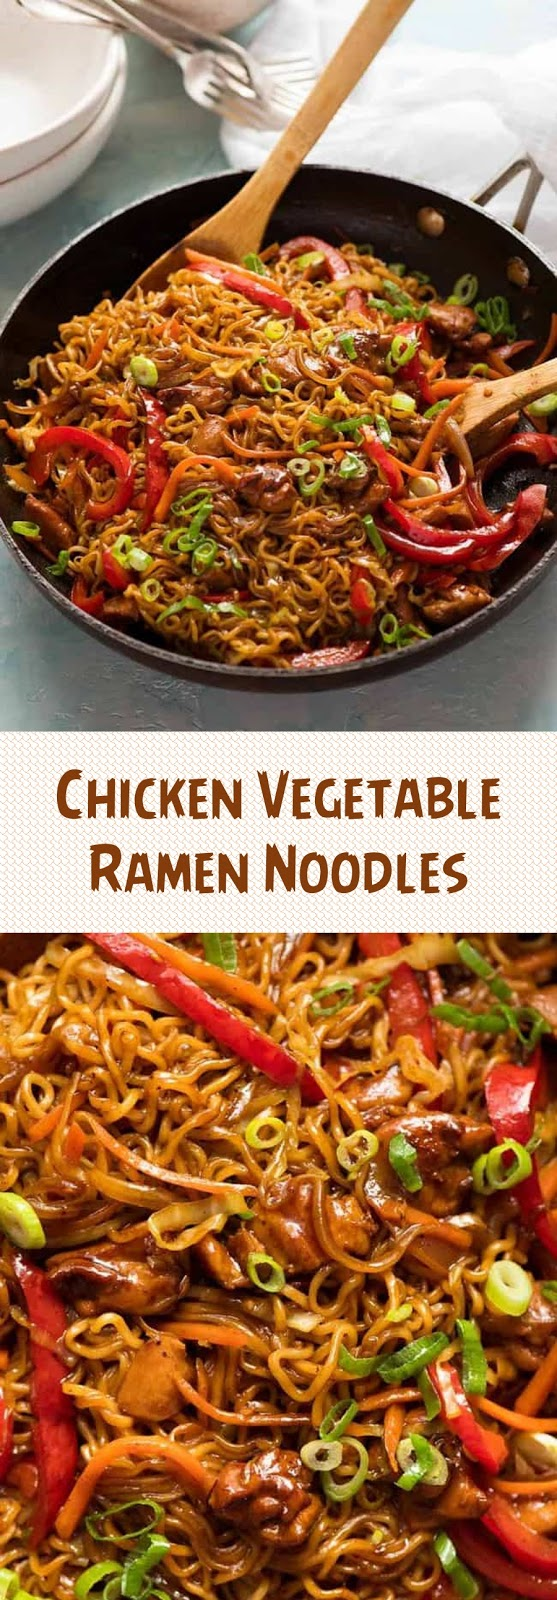 Chicken Vegetable Ramen Noodles